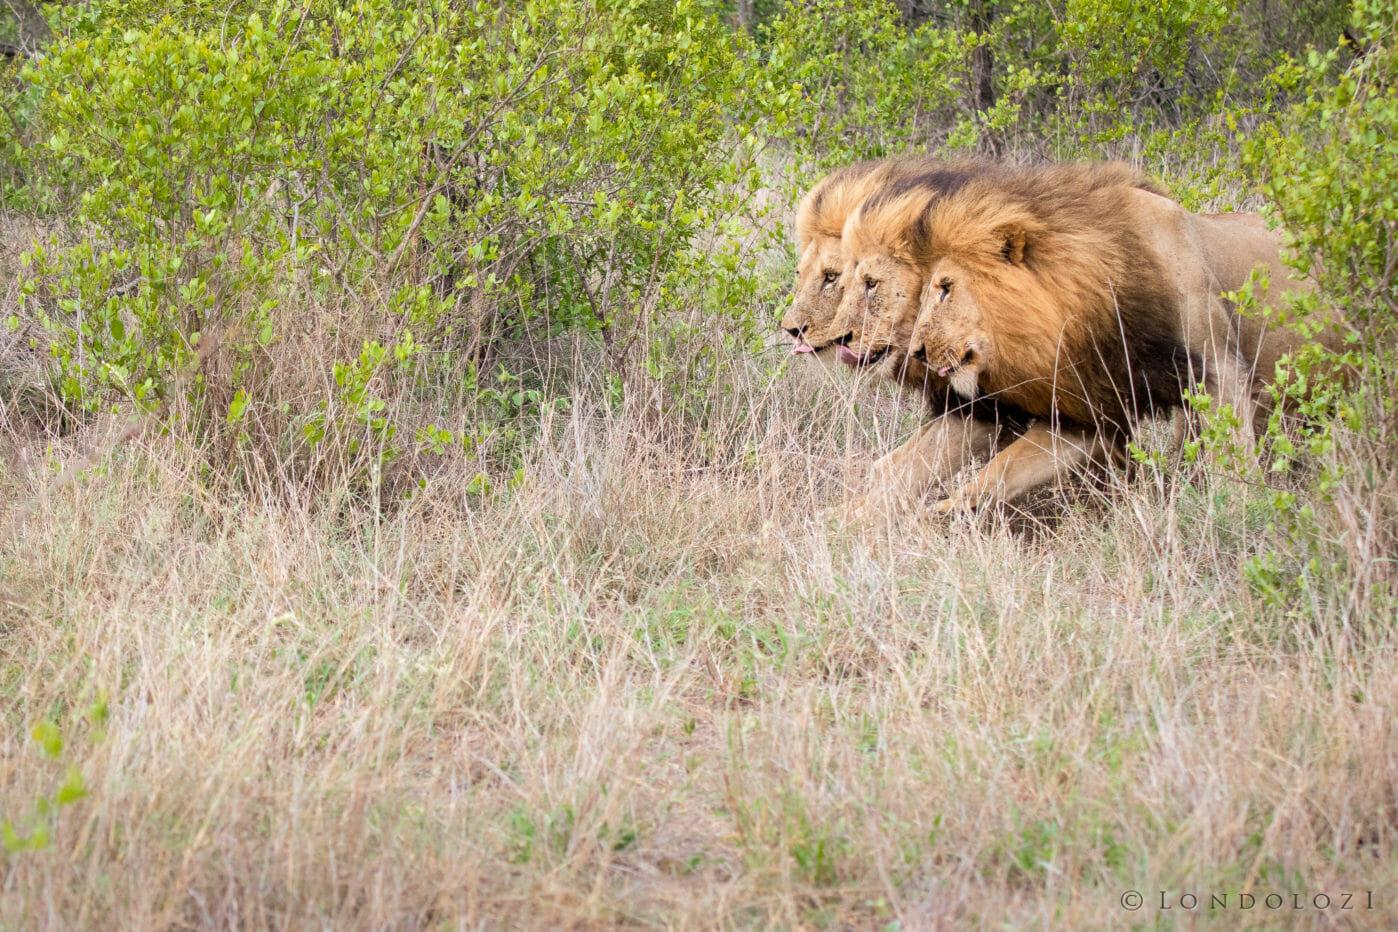 Birmingham Male Lions